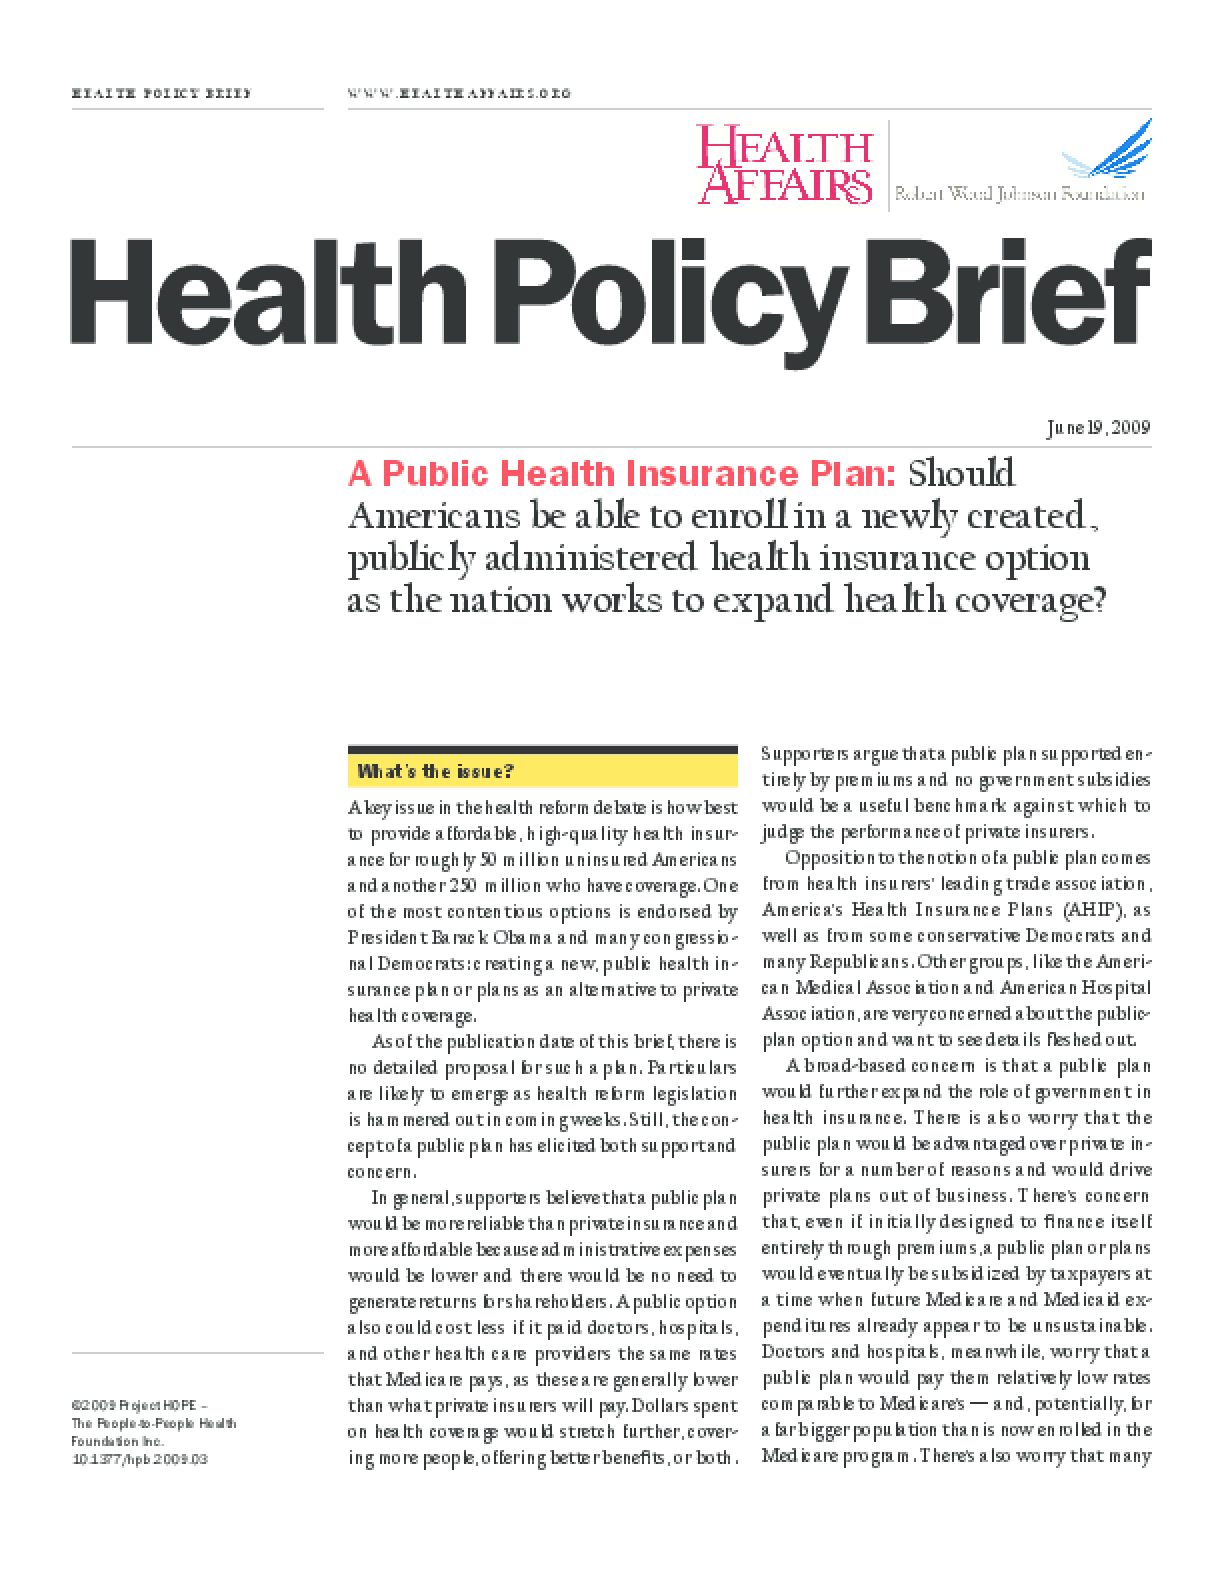 Health Affairs/RWJF Policy Brief: A Public Health Insurance Plan